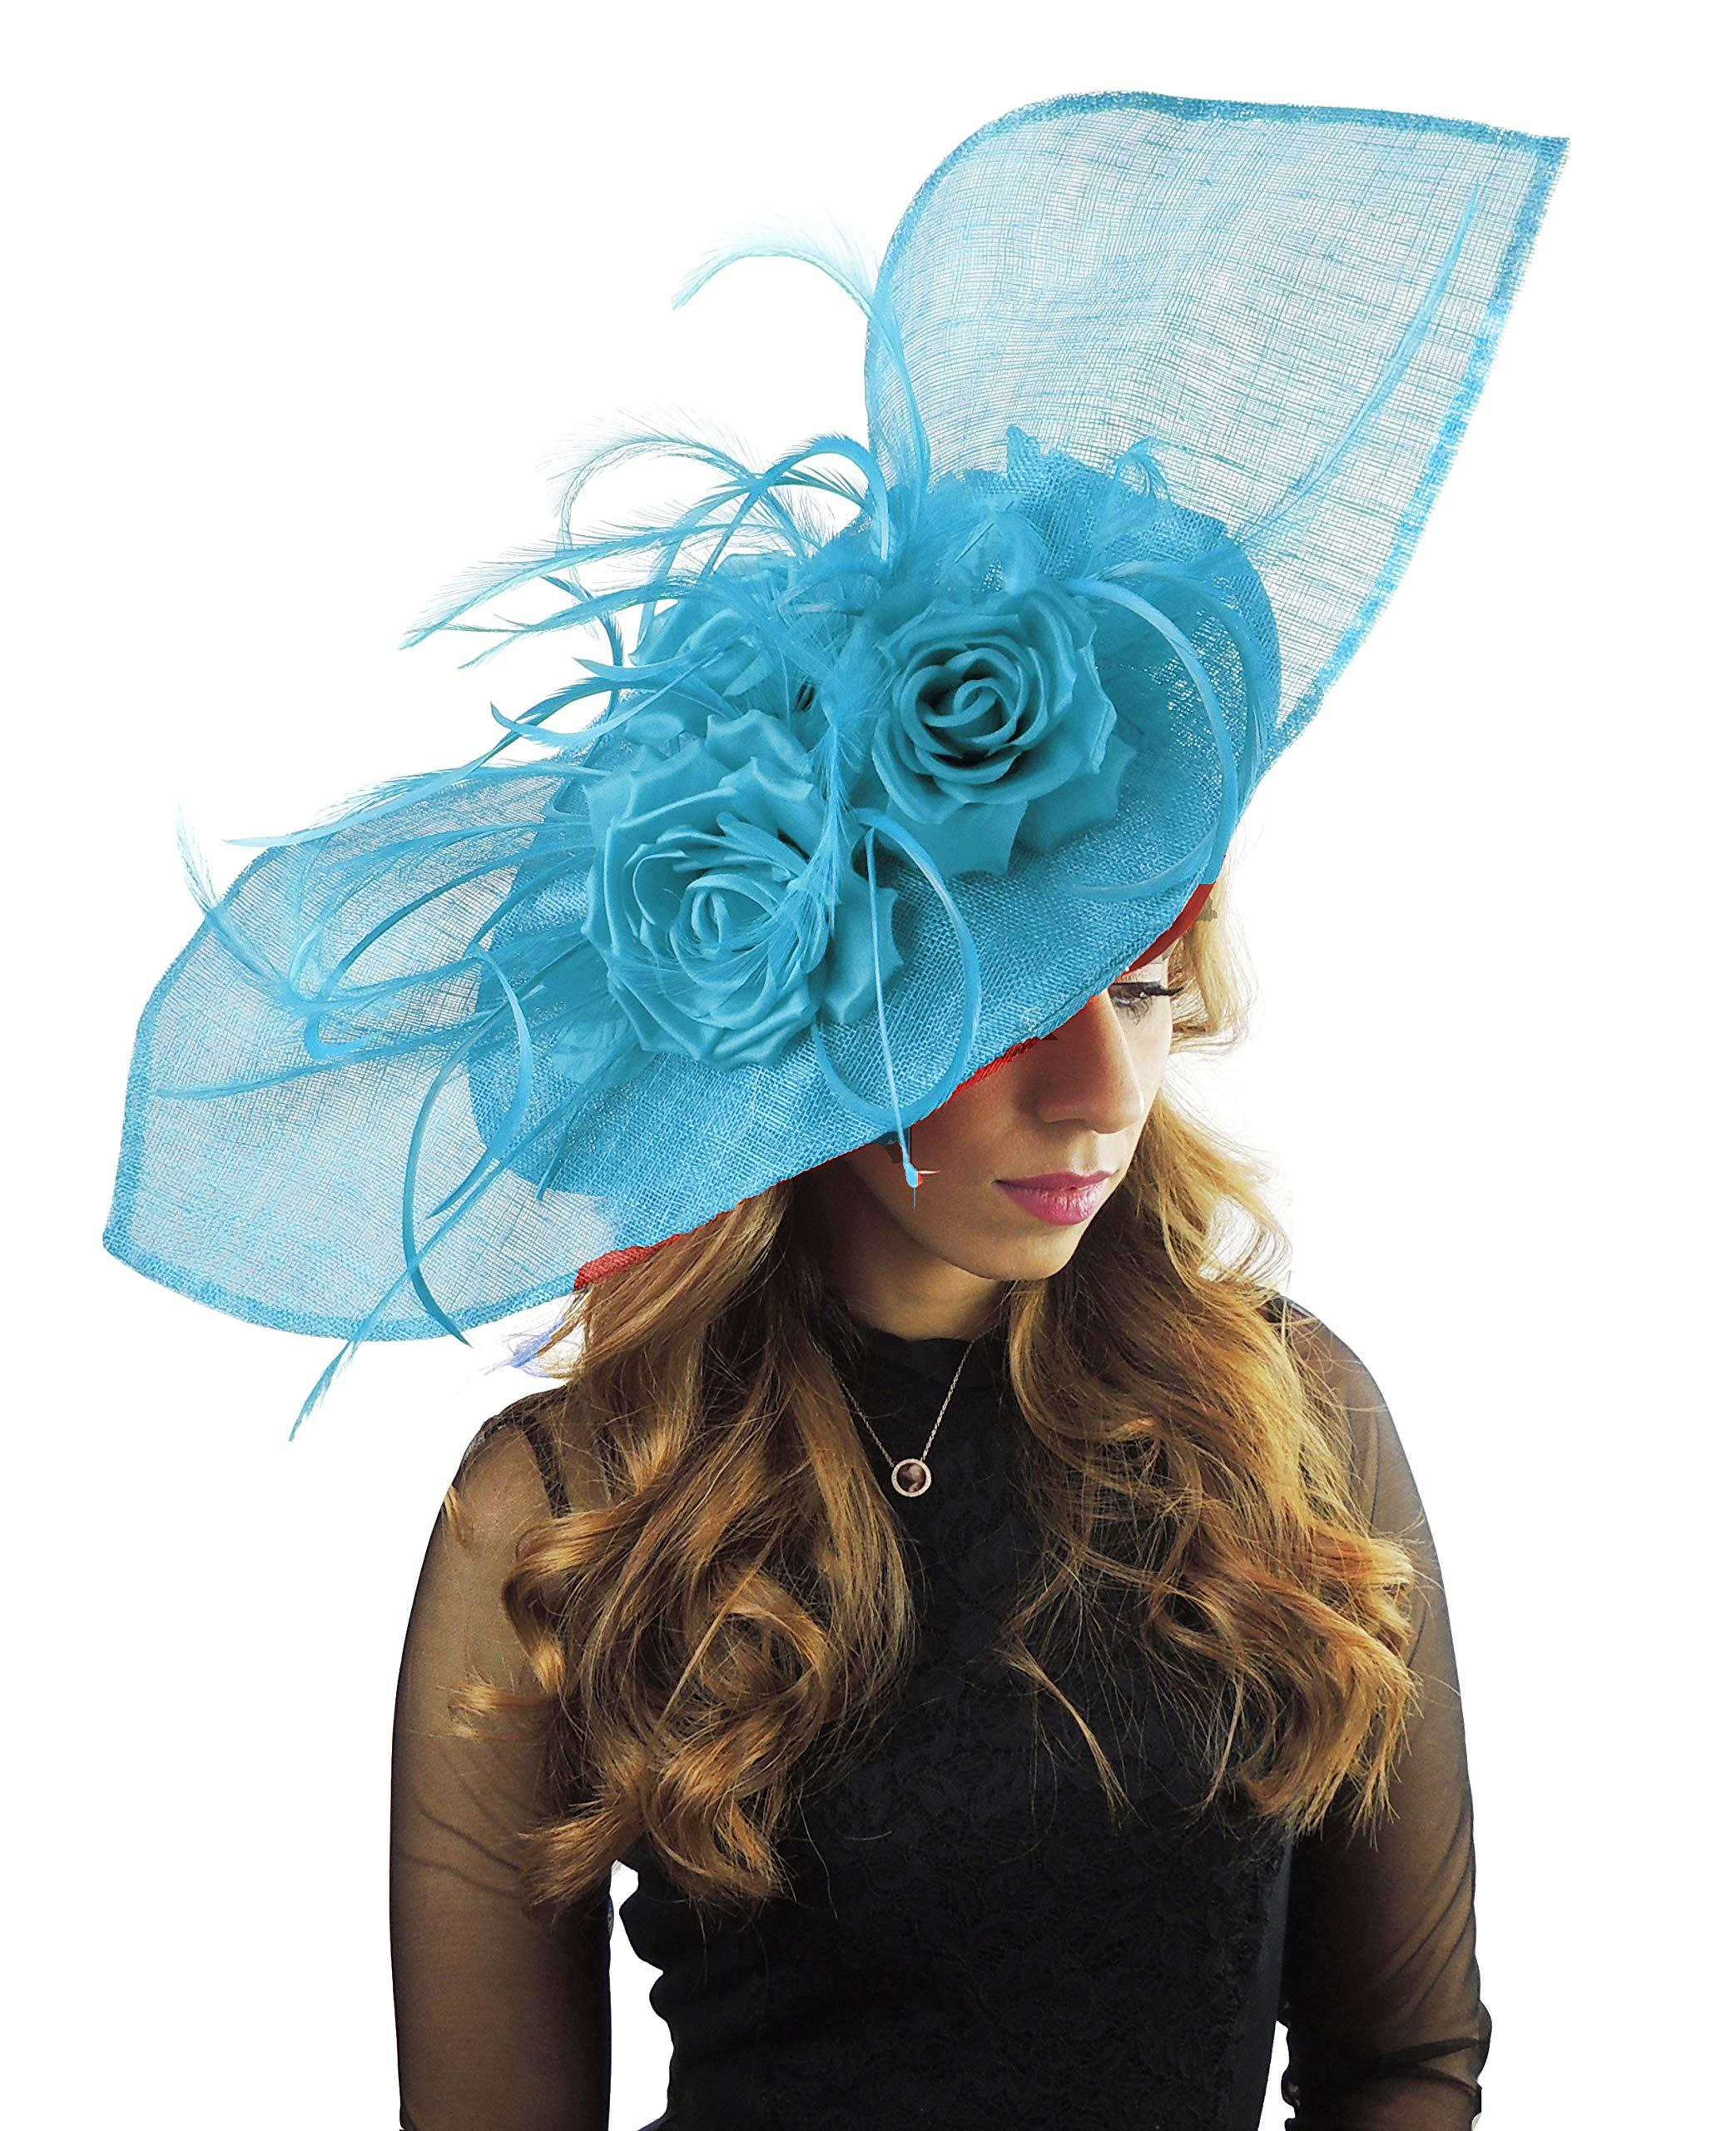 26 Inch Medium Elisaveta Sinamay Ascot Kentucky Derby Fascinator Hat with Headband - Turquoise Dark